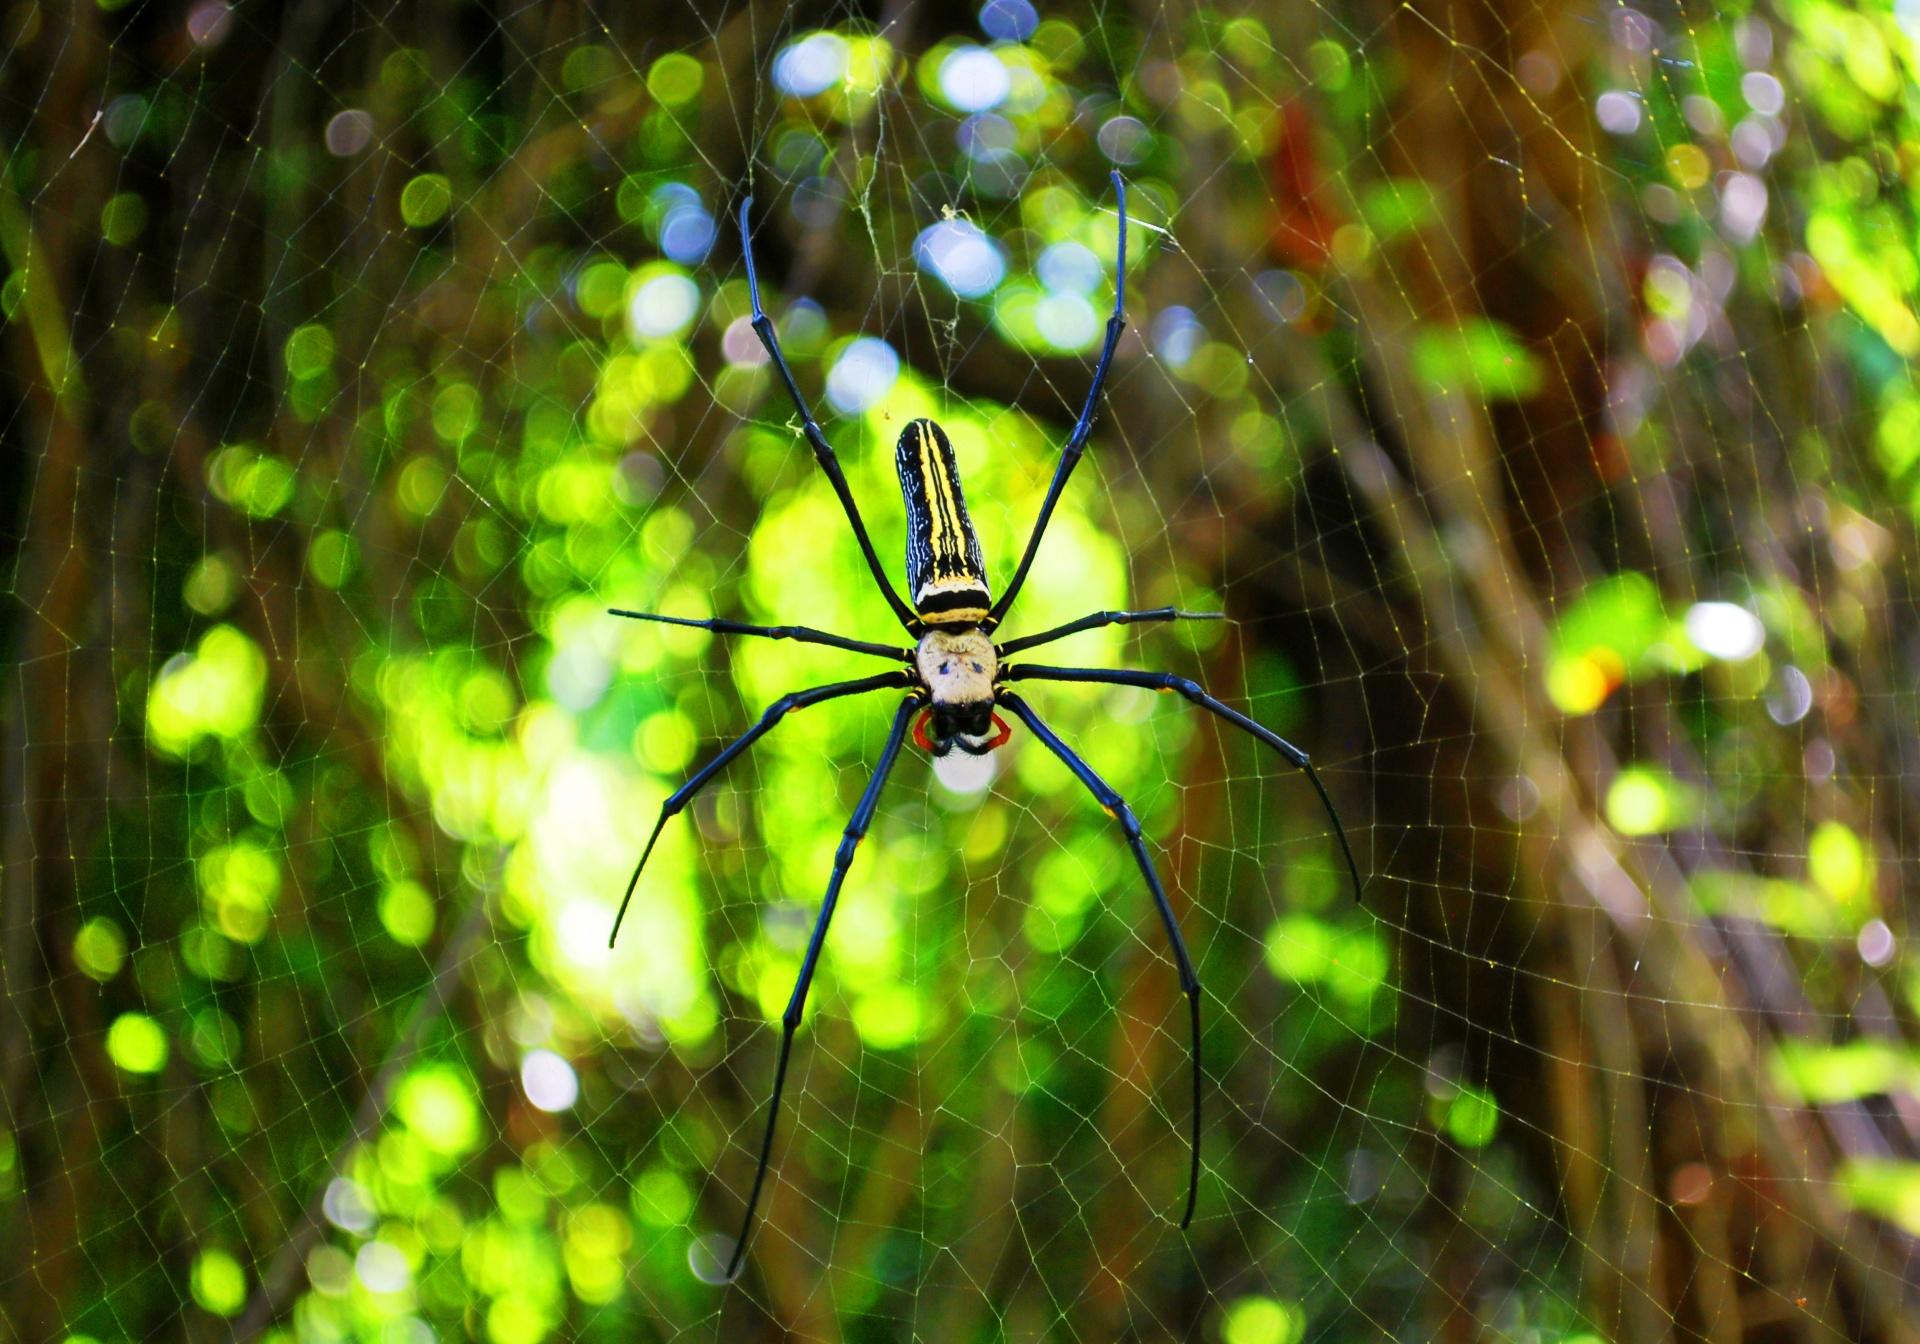 Arachnid, National Be Kind To Spiders Week, Spiders